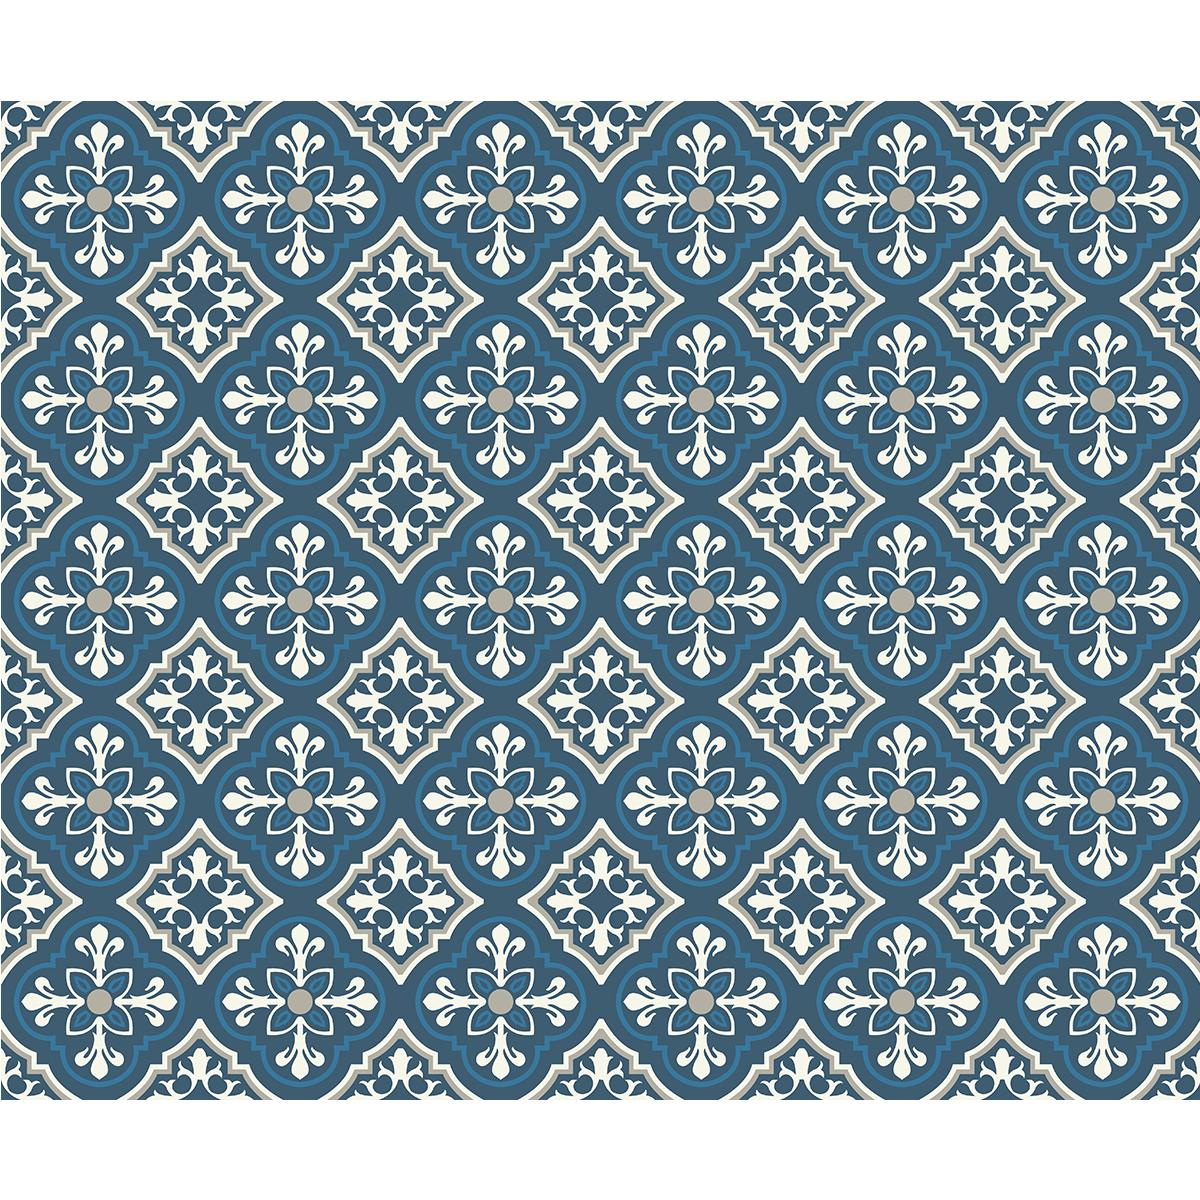 30 stickers carreaux de ciment azulejos lilya cuisine. Black Bedroom Furniture Sets. Home Design Ideas